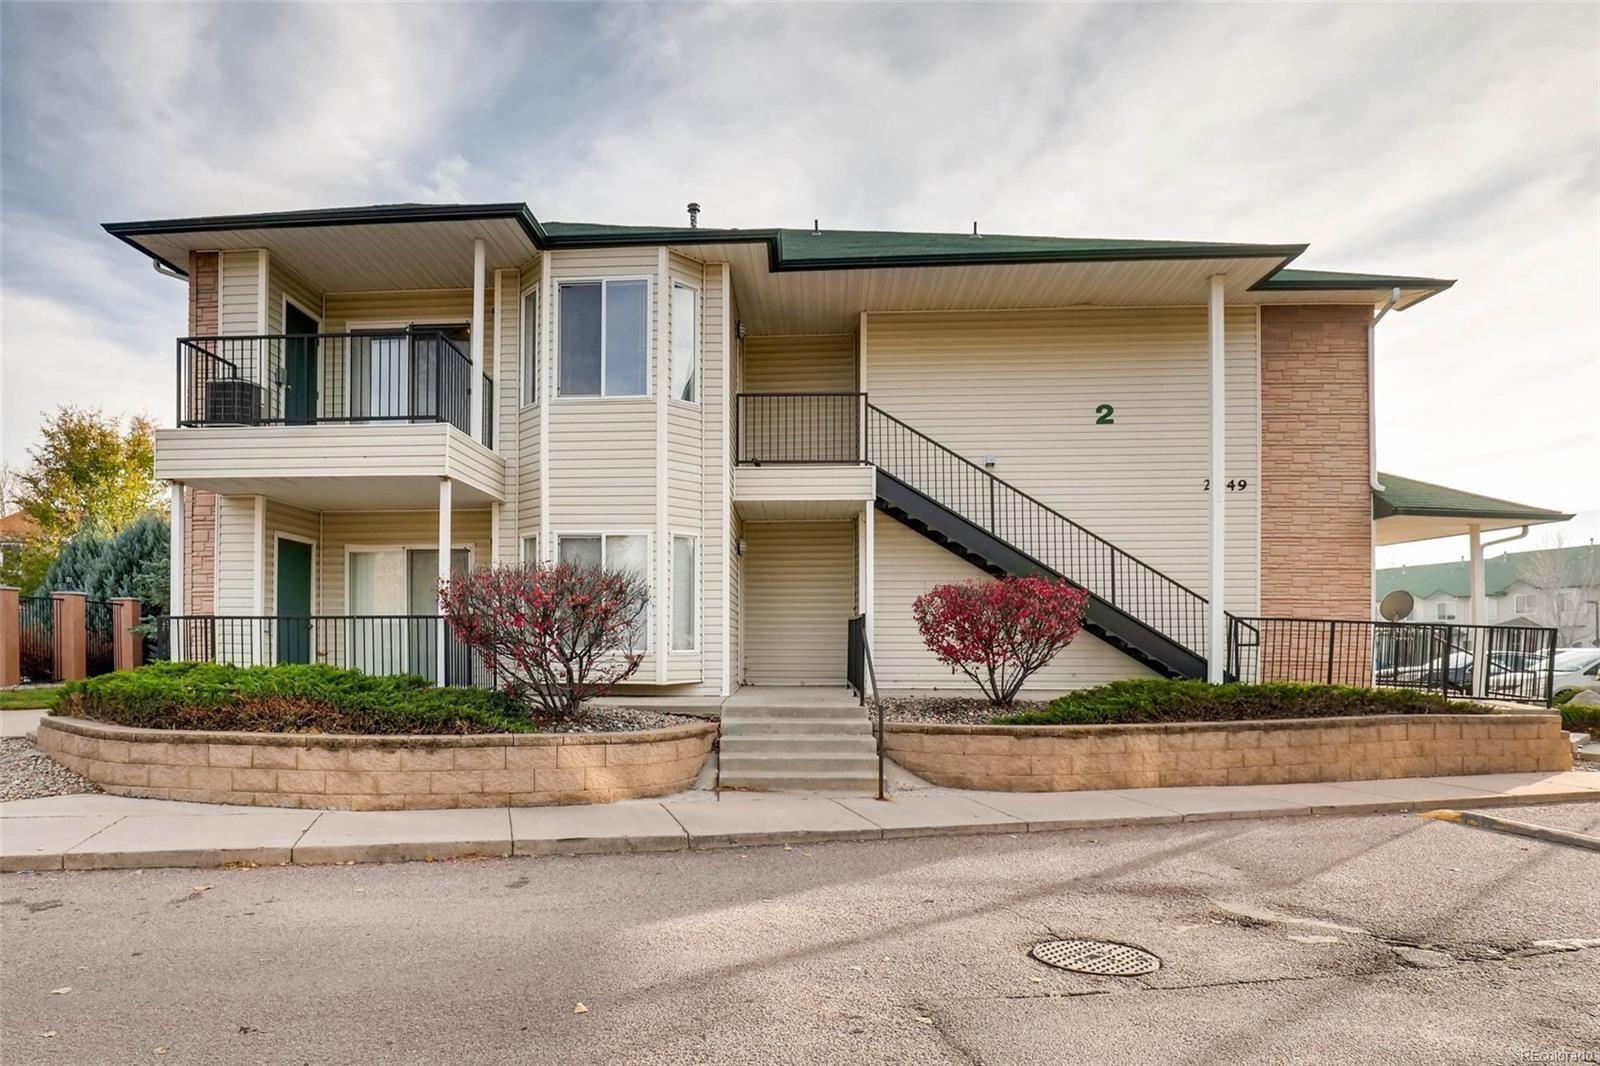 MLS# 9808696 - 1 - 2049 Legacy Ridge View, Colorado Springs, CO 80910